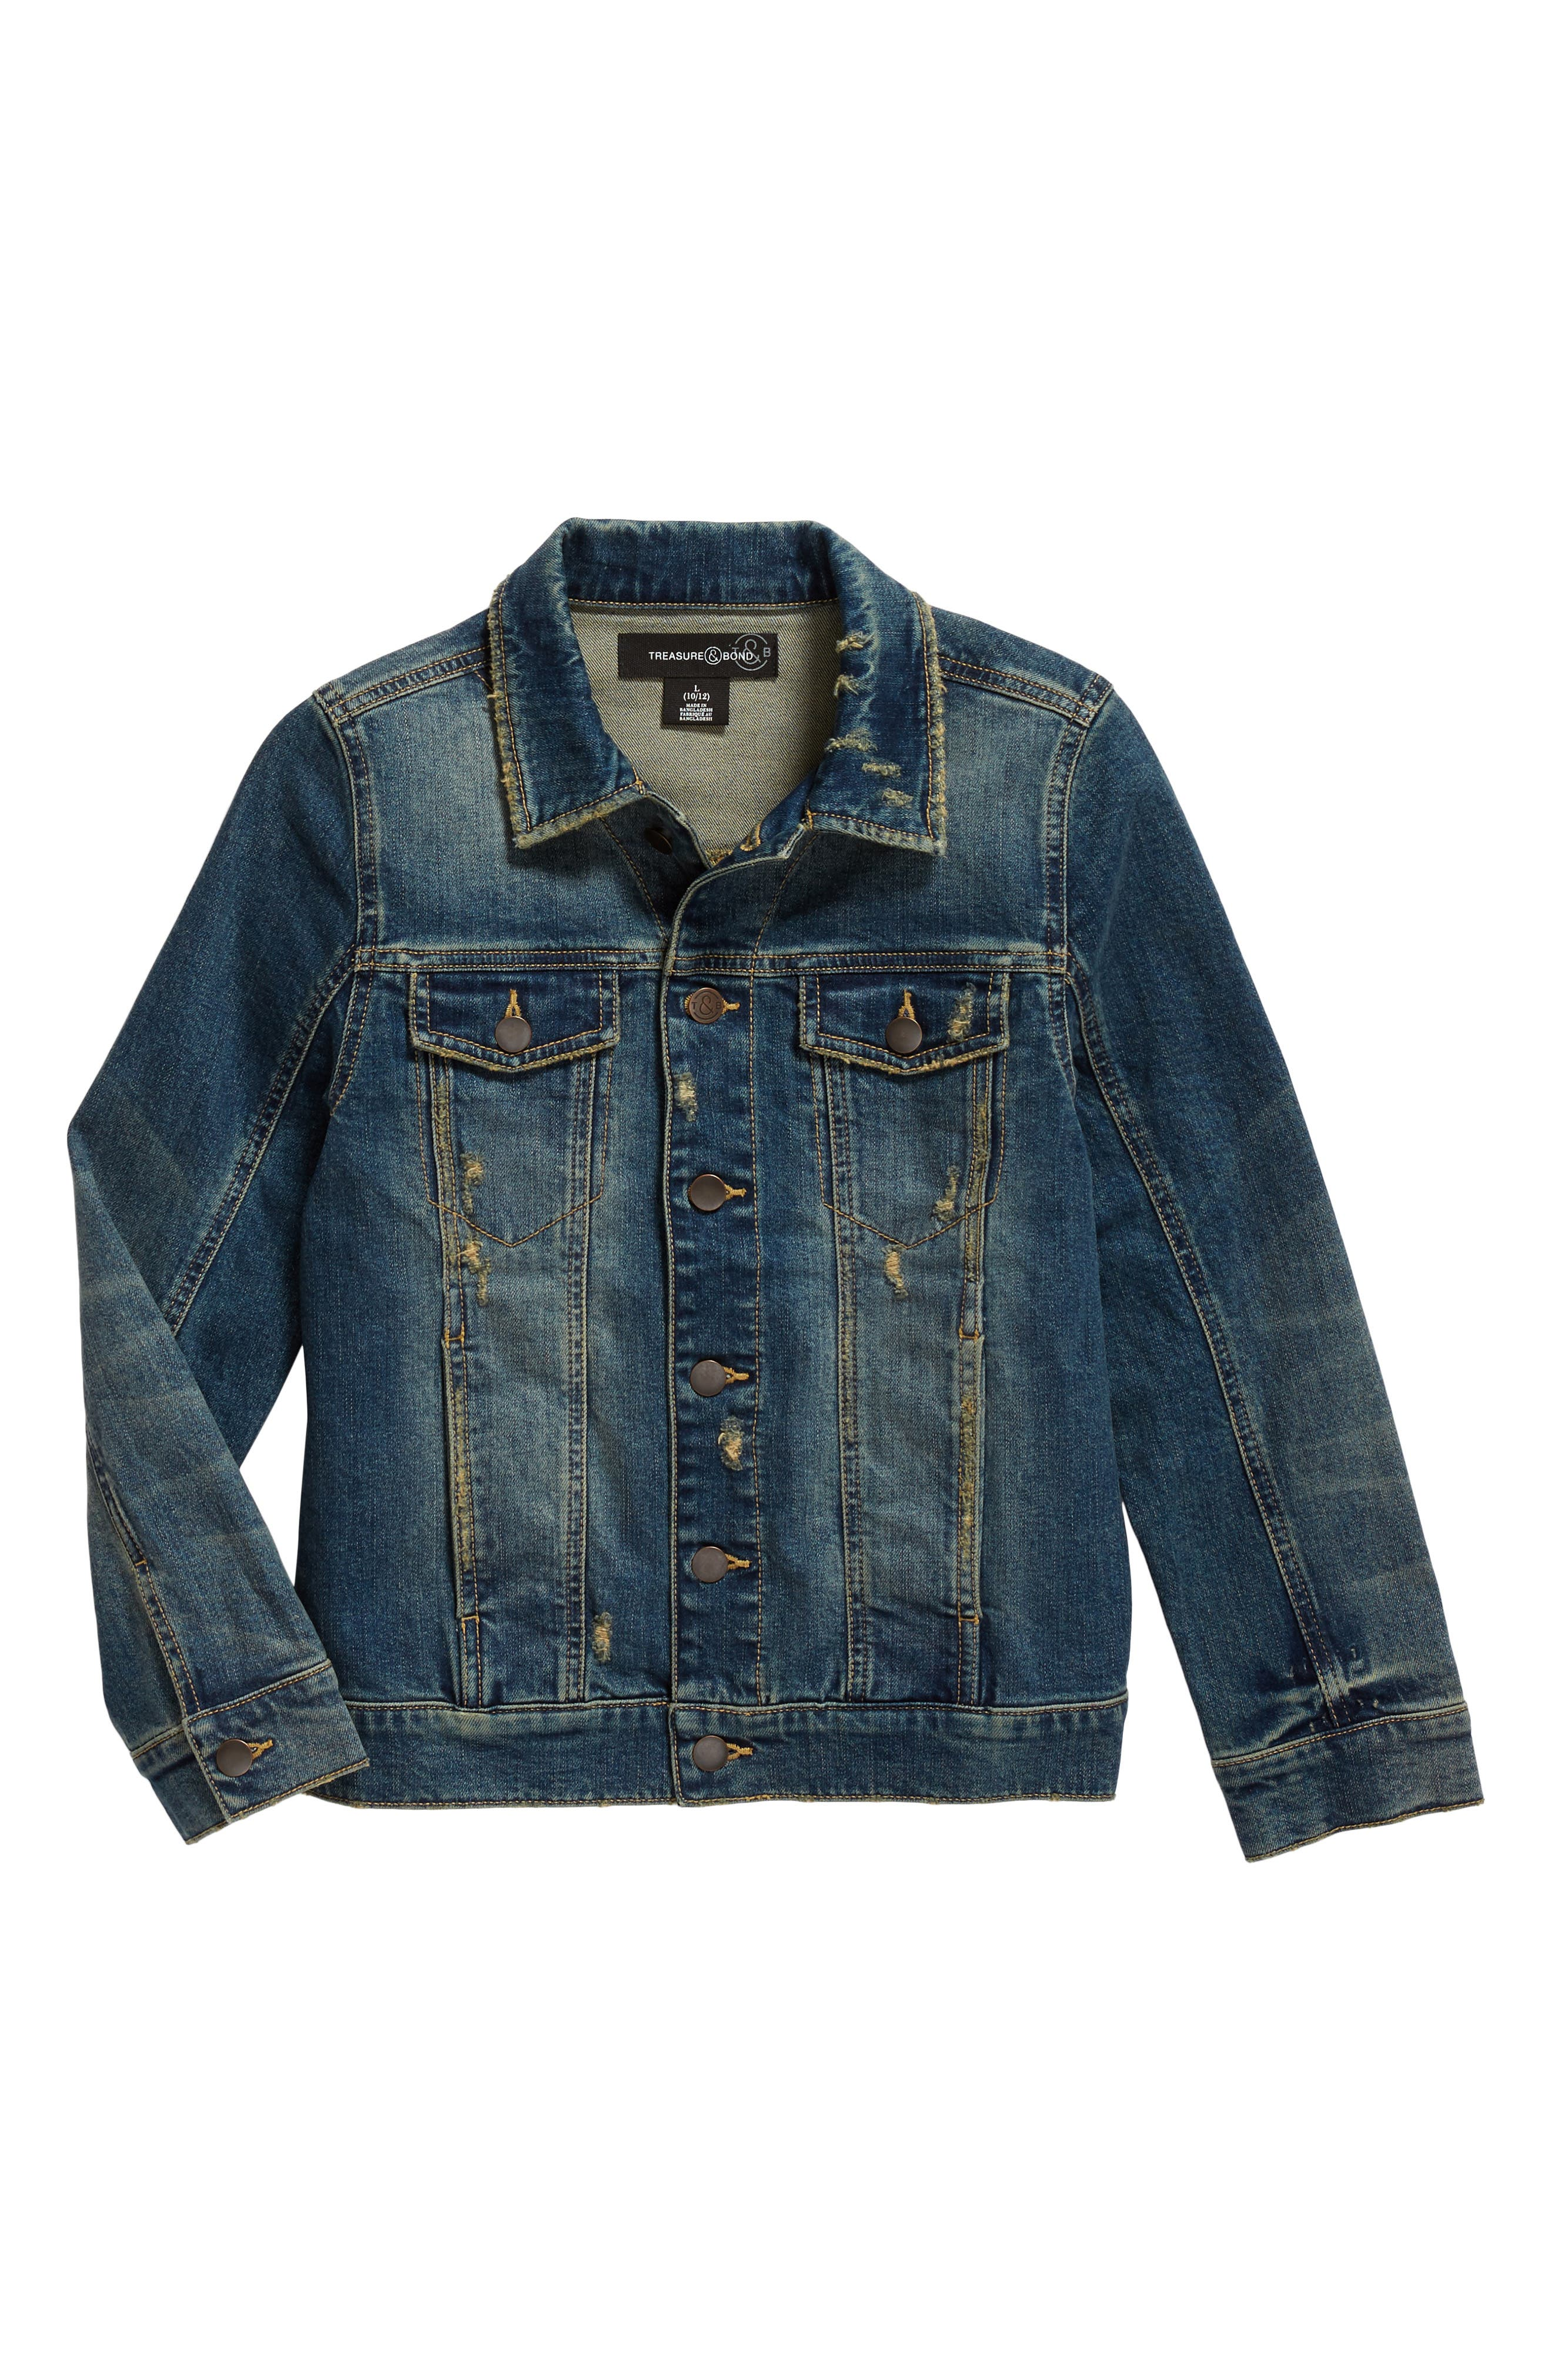 Kids coats jackets nordstrom treasure bond distressed denim jacket big boys biocorpaavc Images